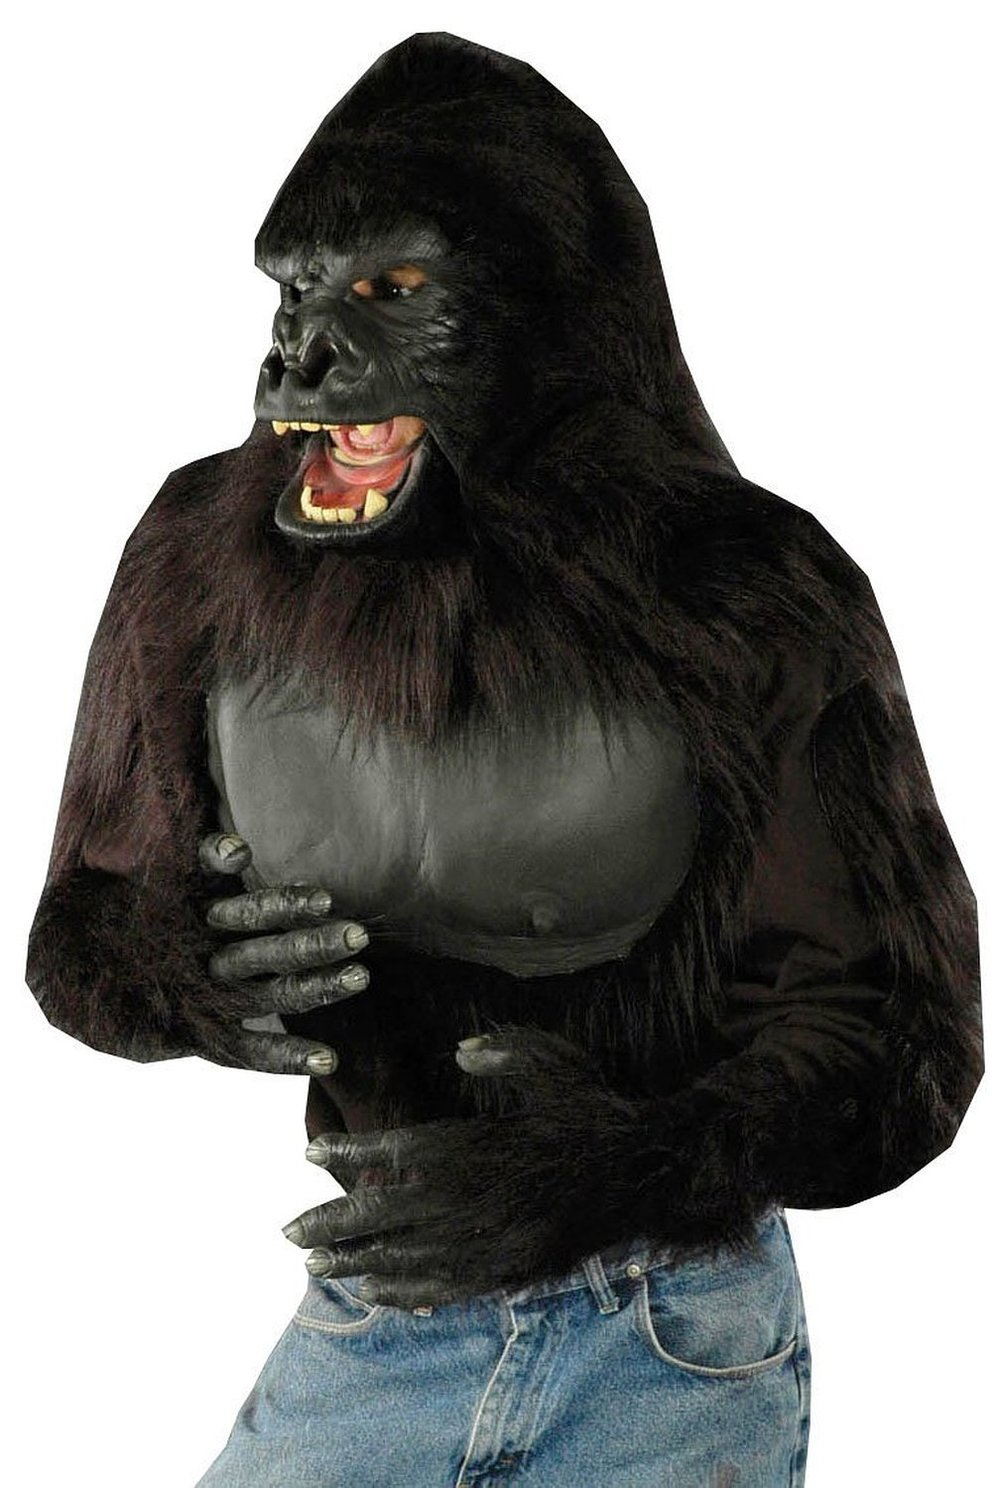 gorillaparty.jpg